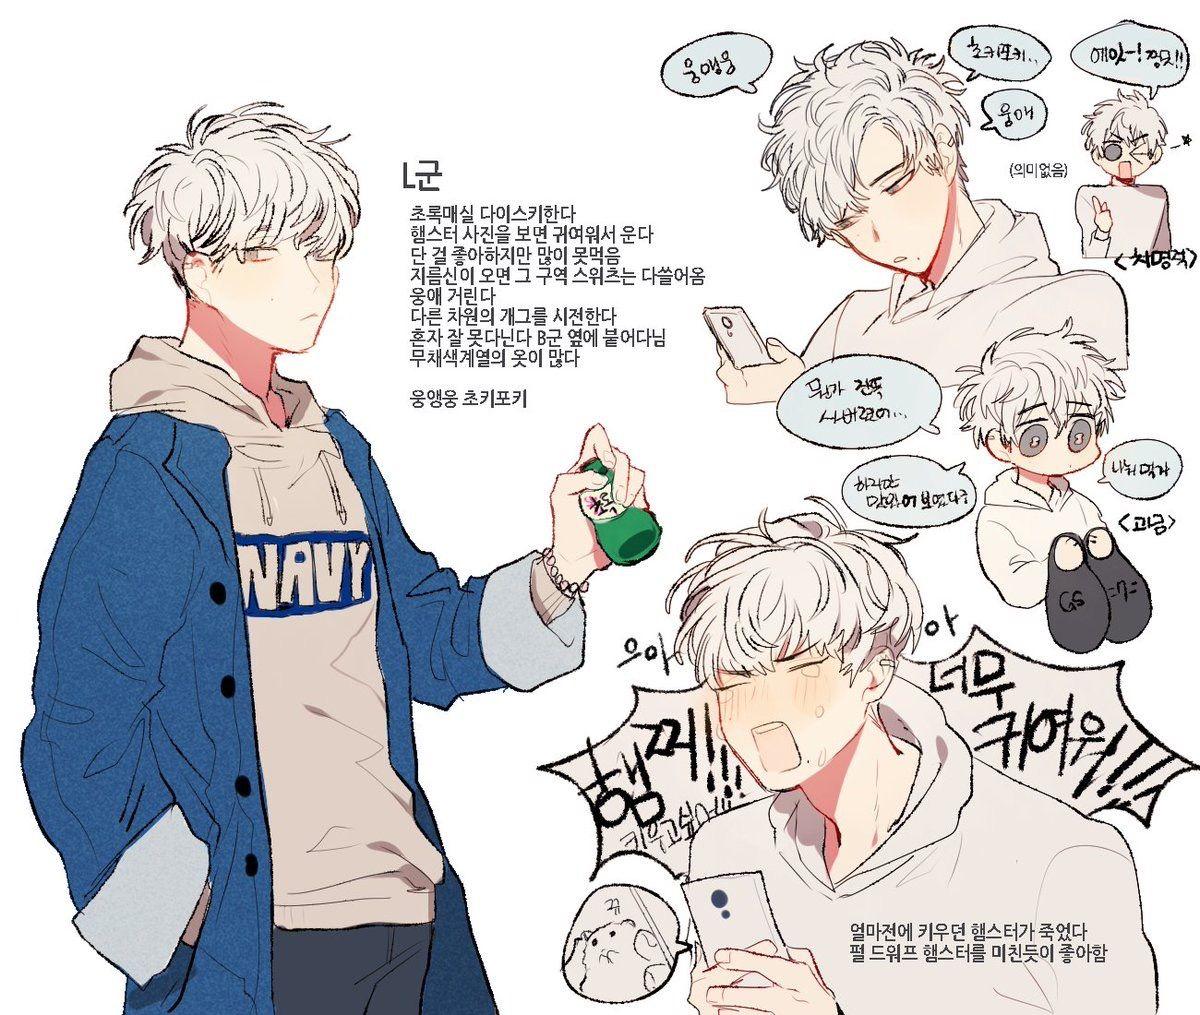 Idea by YaoiiBoii on ᴄᴜᴛᴇ ᴀɴɪᴍᴇ ɢᴜʏs Anime character